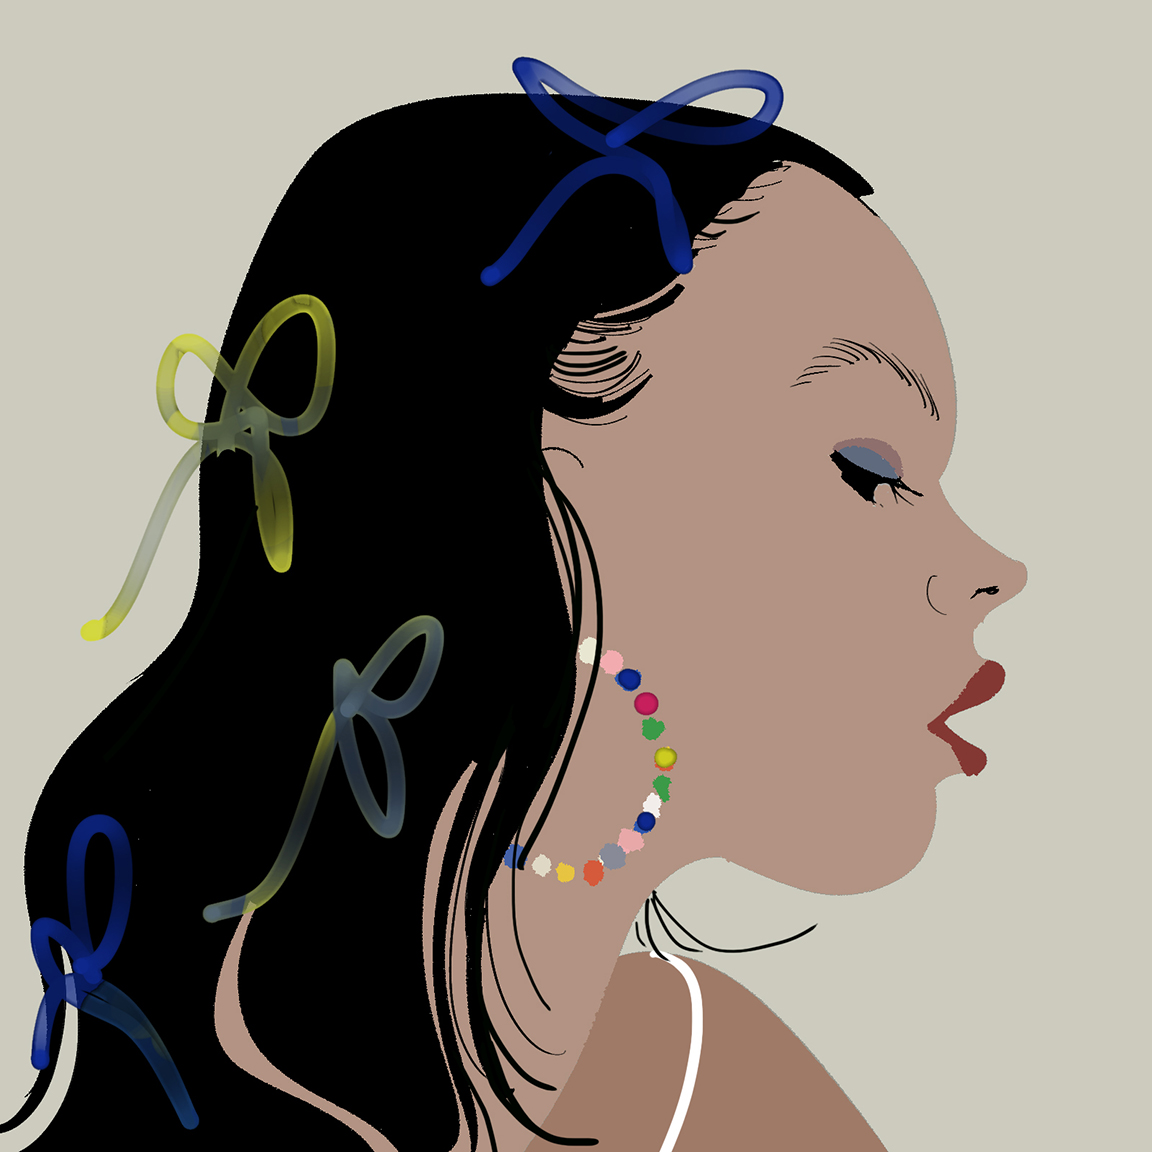 GirlsclubAsia-Illustrator-Eve Liu-File23